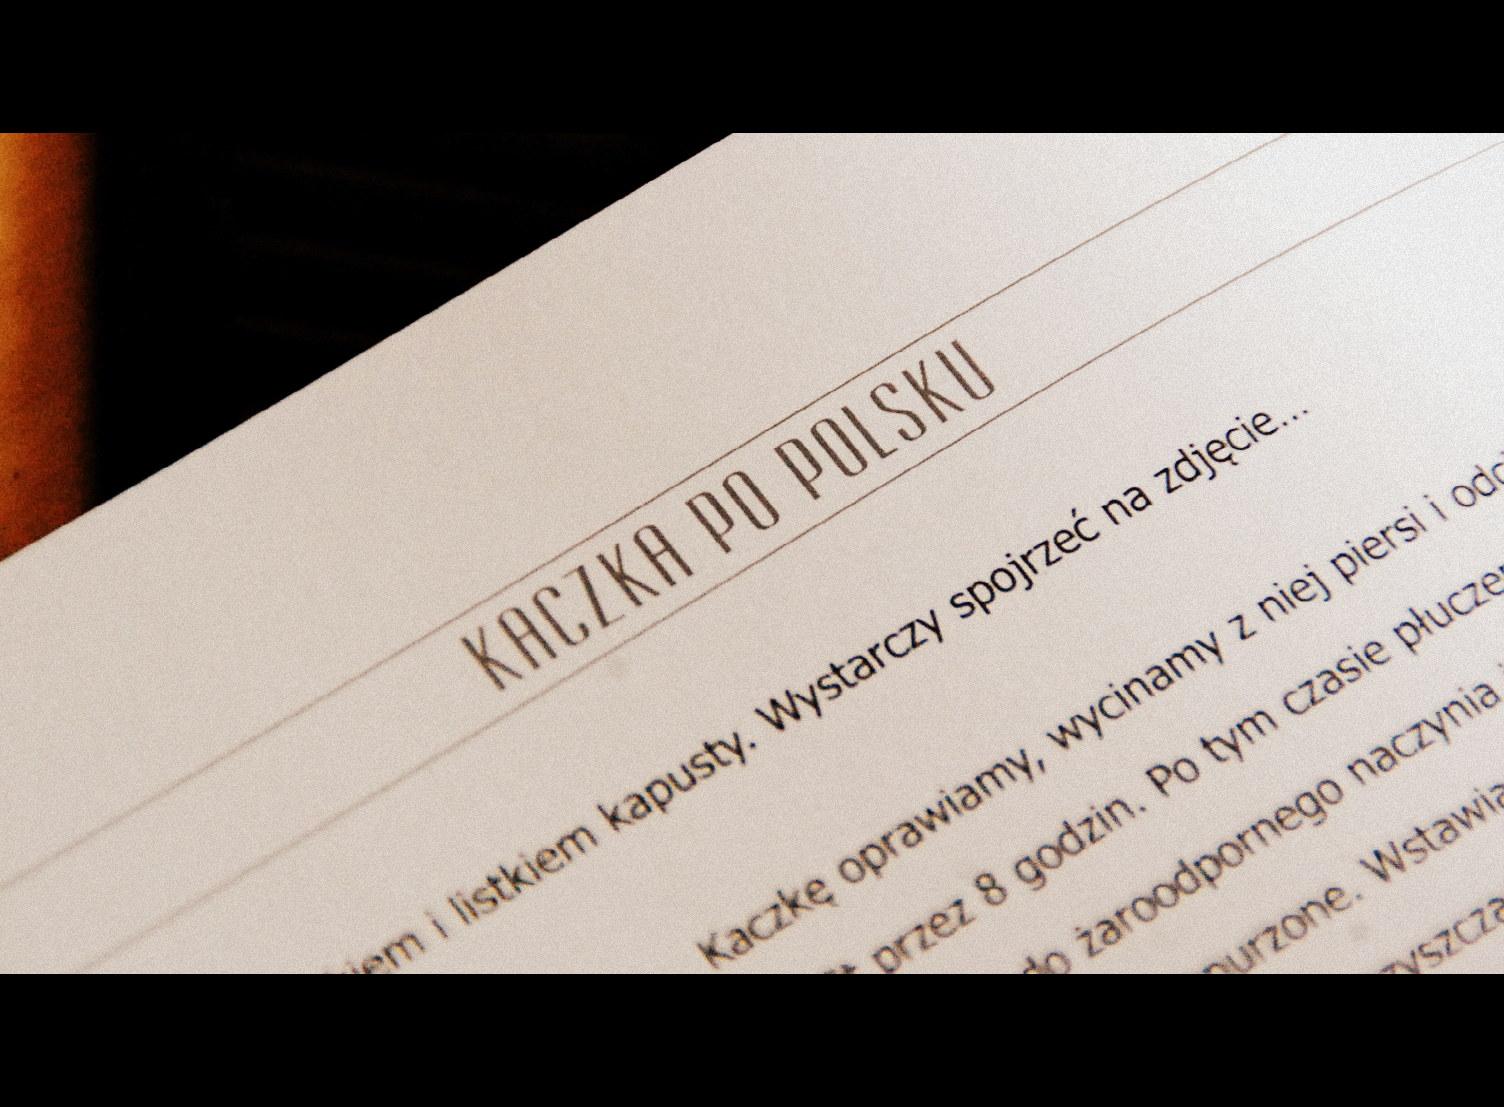 Asia White Kitchen Kuchnia Polska Xxi Wieku Amaro